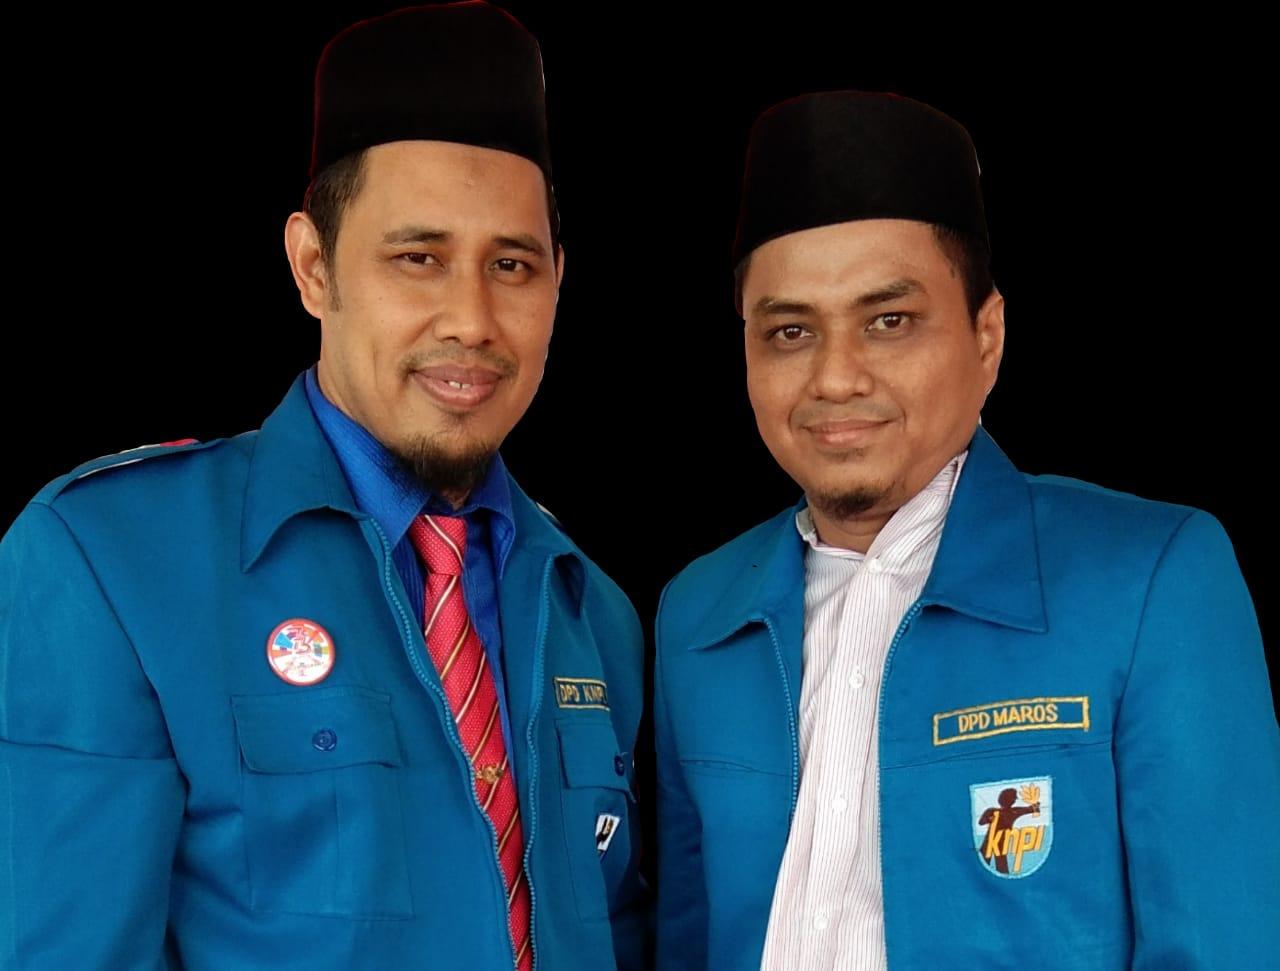 SK Karetaker di Keluarkan DPP KNPI, Sejumlah Tokoh Pemuda Maros Masuk Dalam Kepengurusan DPD Sulsel